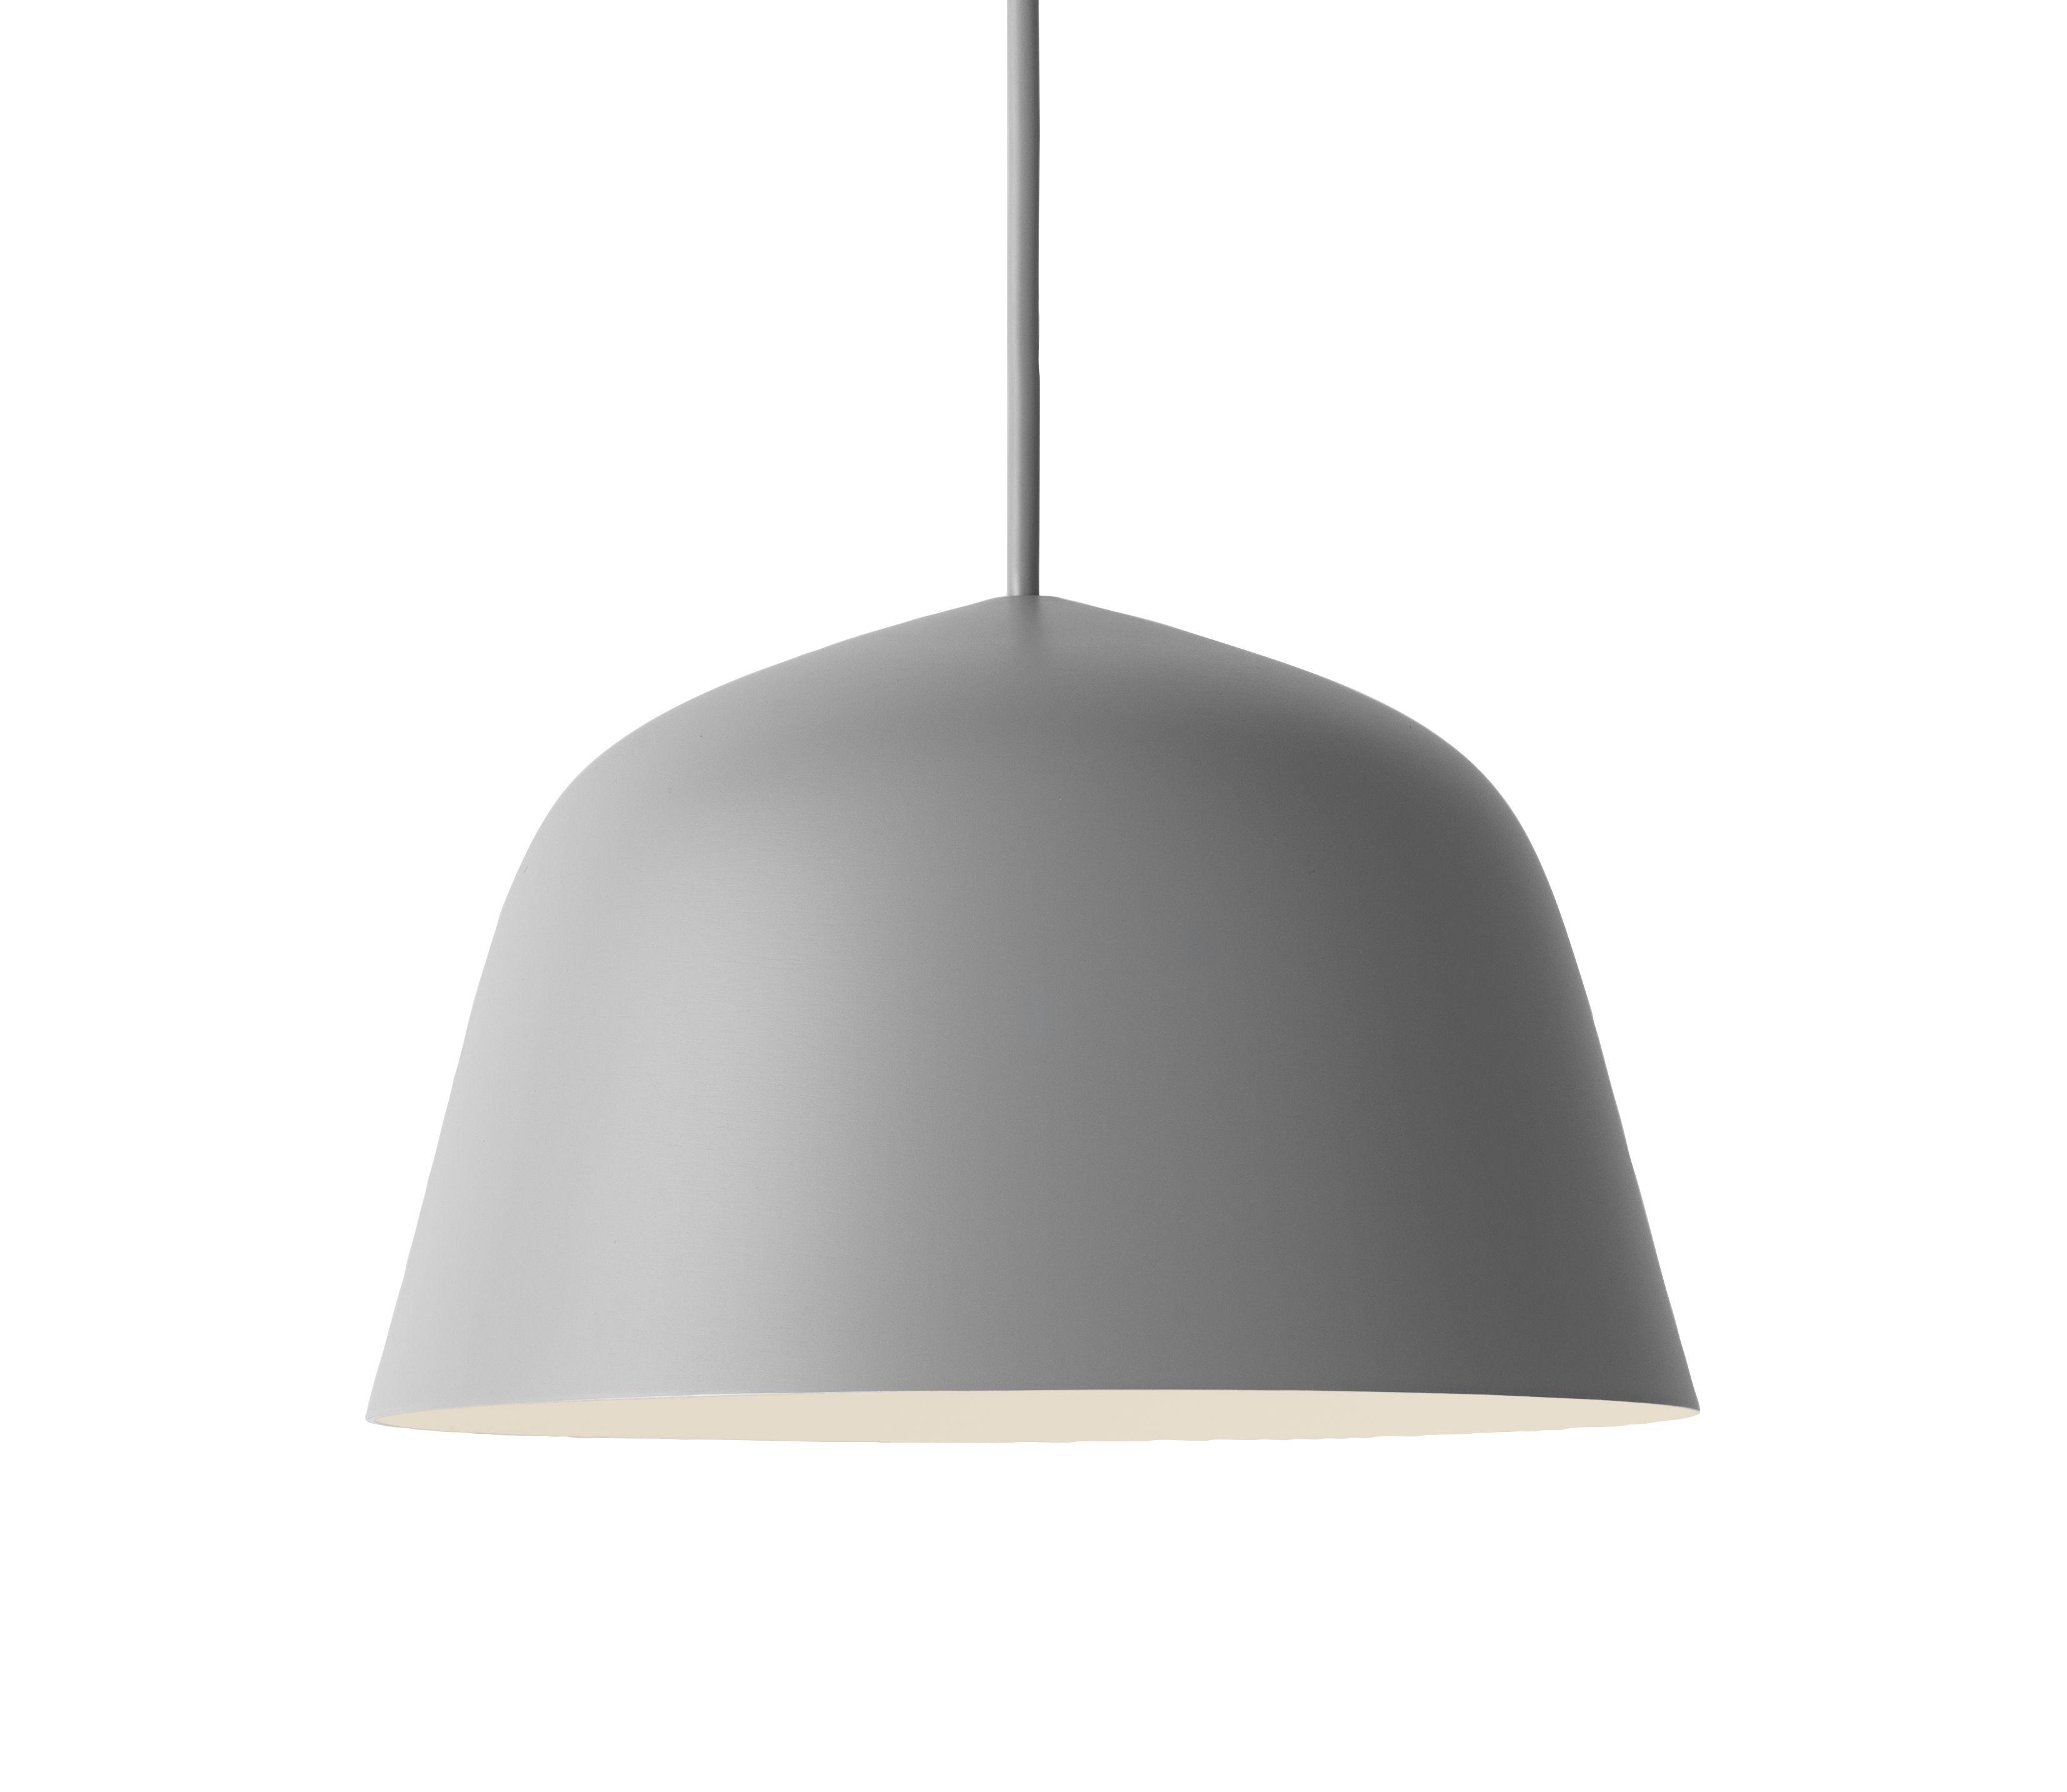 Leuchten - Pendelleuchten - Ambit Pendelleuchte / Ø 25 cm - Metall - Muuto - Grau - Aluminium